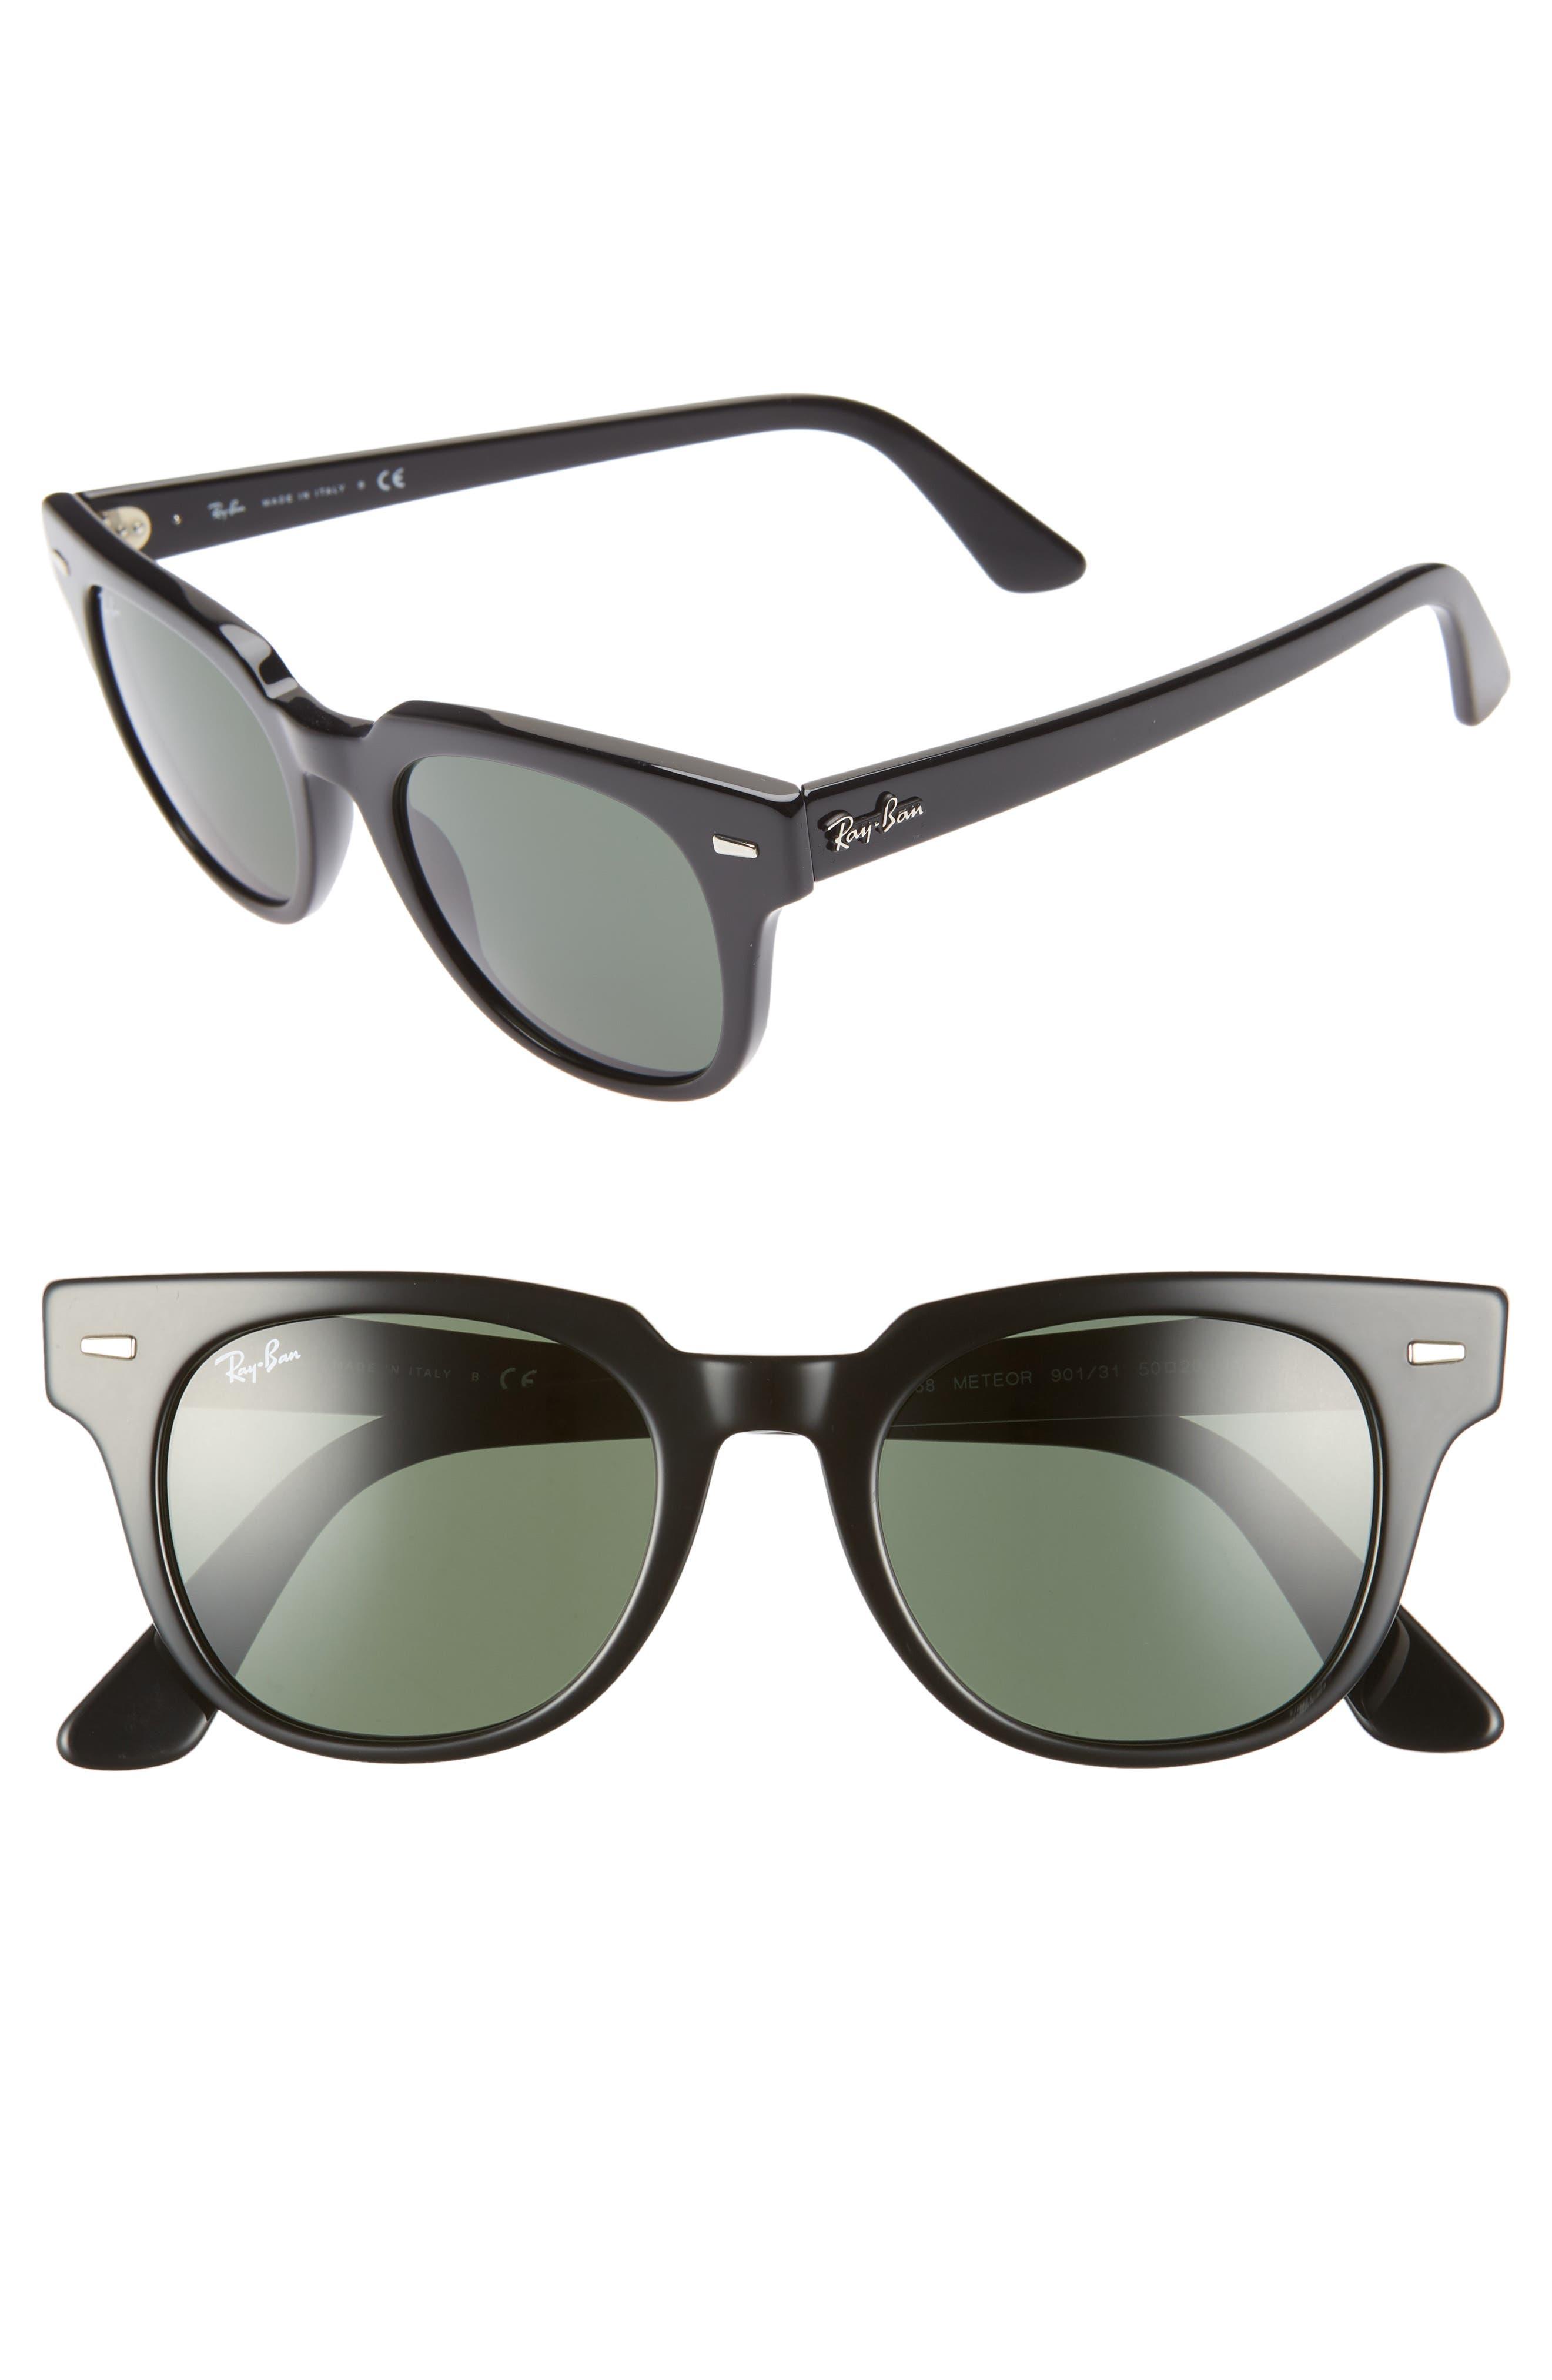 Meteor 50mm Wayfarer Sunglasses by Ray Ban